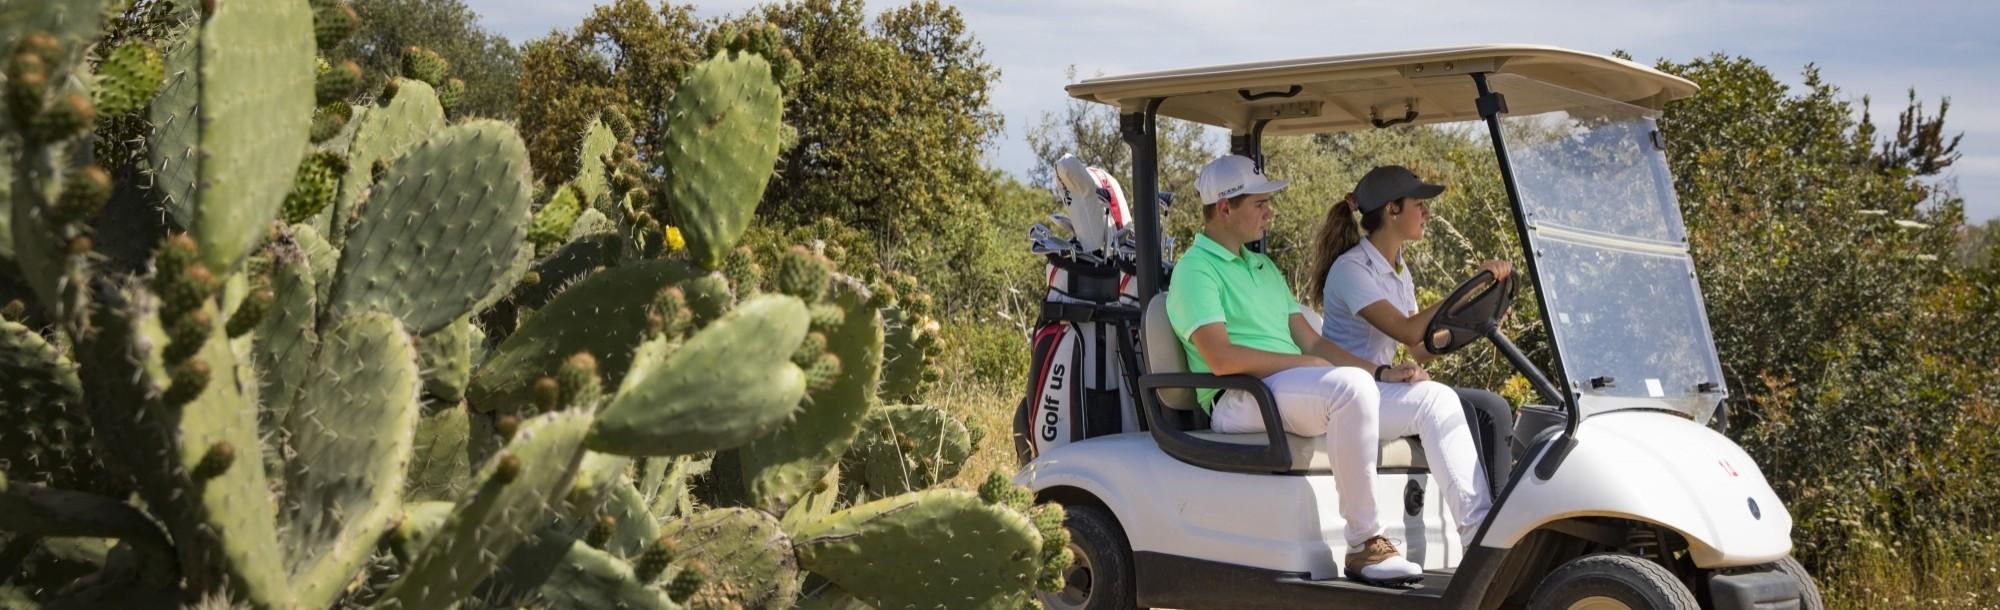 Golf cart a Is Molas Resort